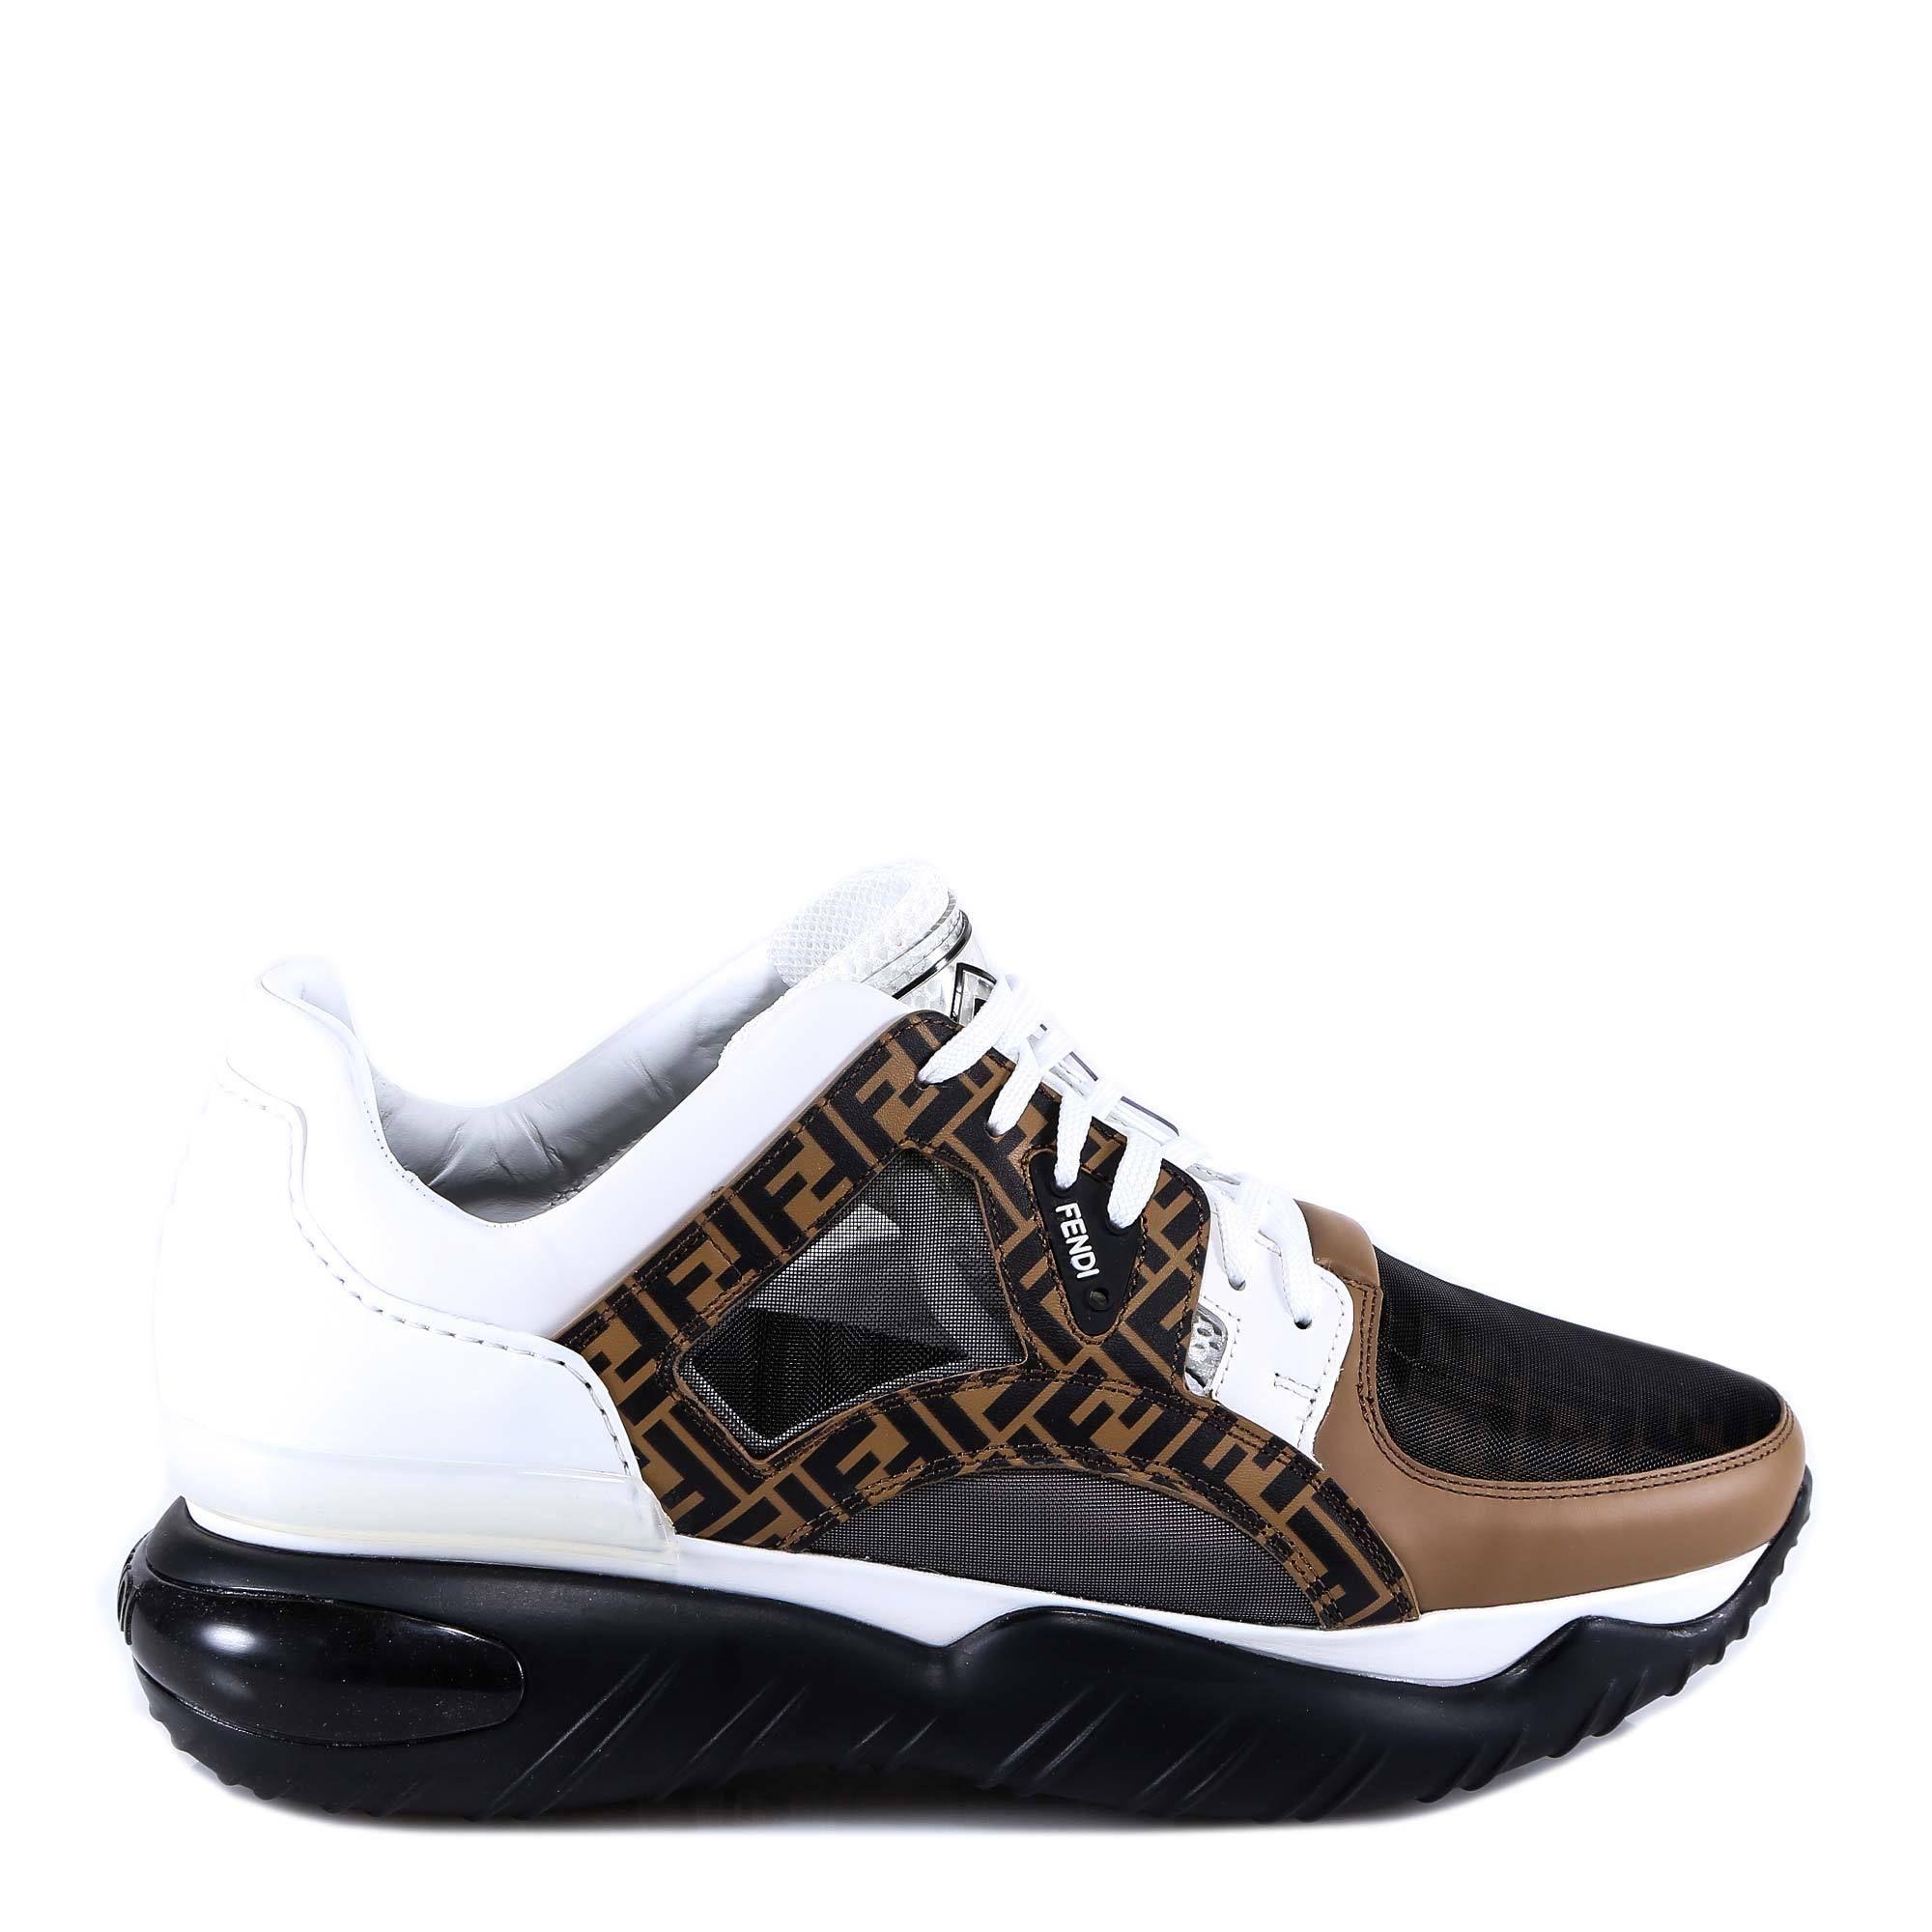 e90650610d FENDI FENDI FF MONOGRAM SNEAKERS. #fendi #shoes   Fendi in 2019 ...